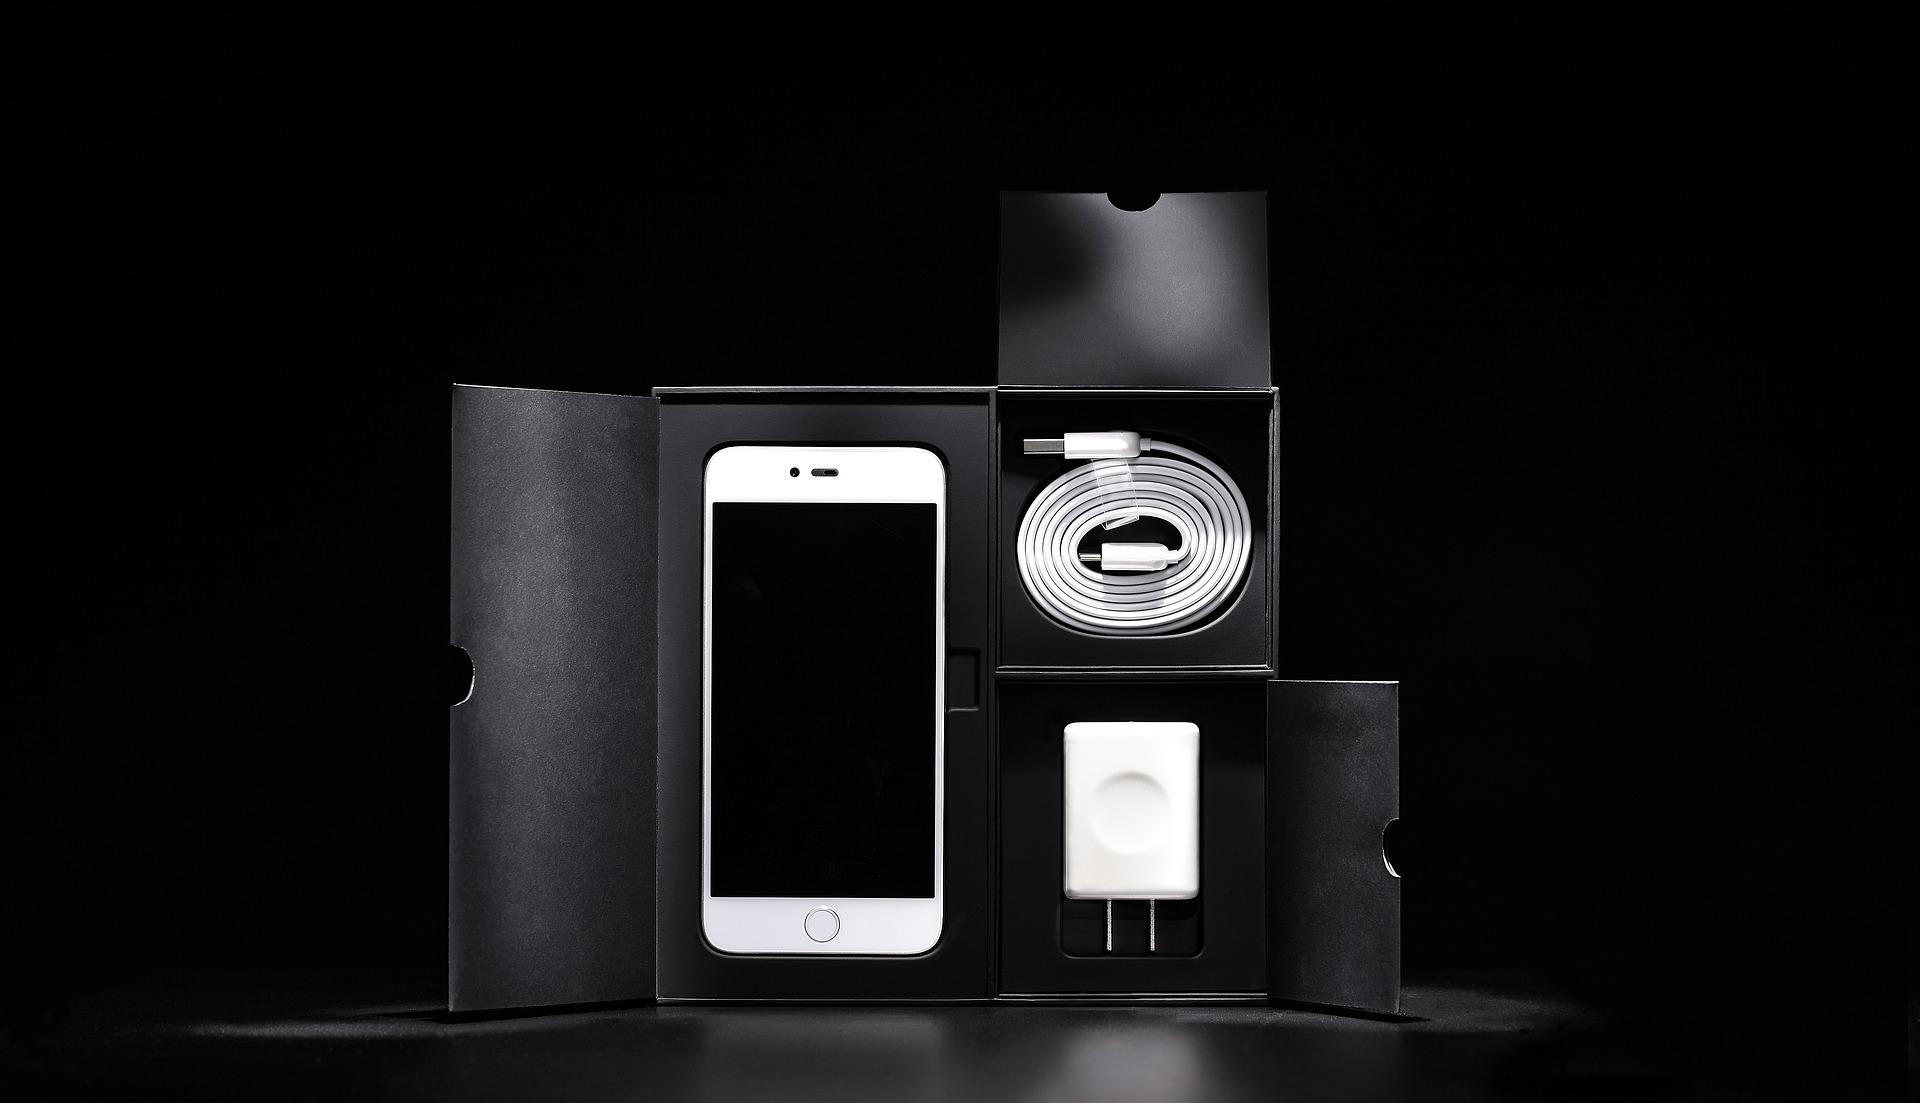 powerbank solar test powerbank ratgeber. Black Bedroom Furniture Sets. Home Design Ideas